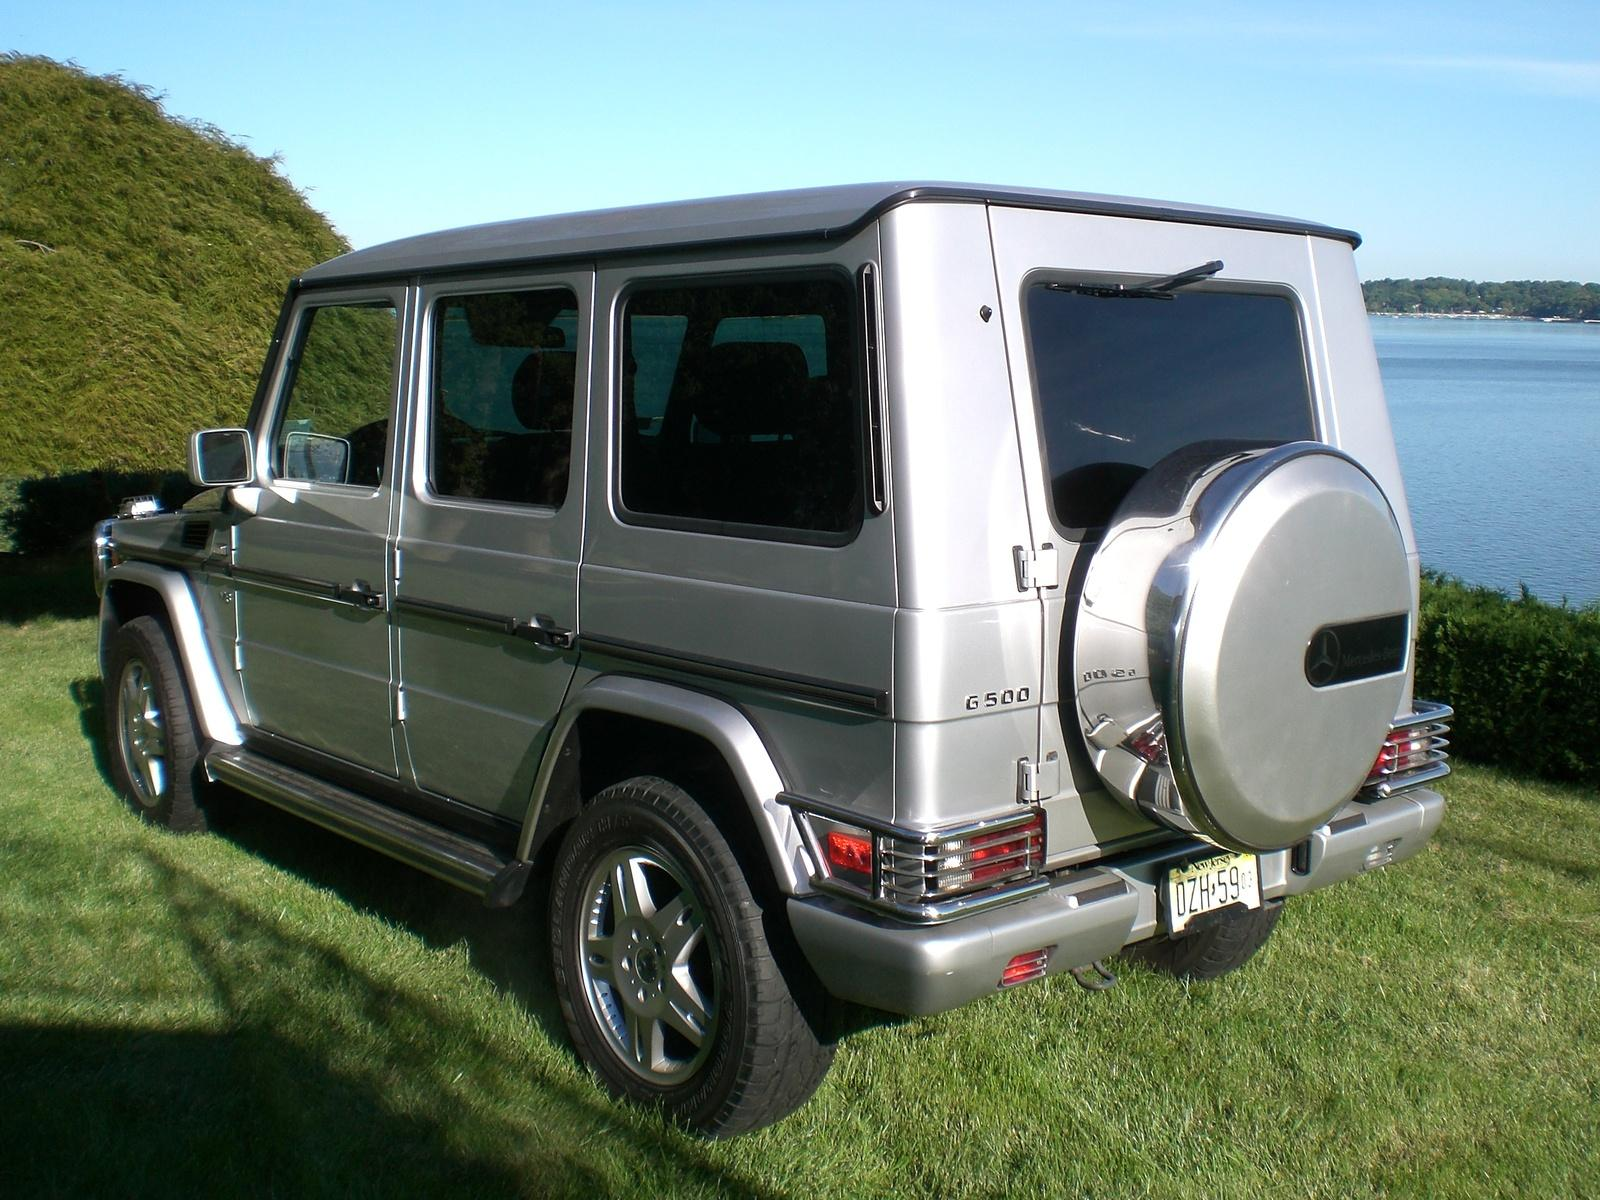 2002 Mercedes Benz G Class Information And Photos Zombiedrive Sprinter Fuse Box 800 1024 1280 1600 Origin